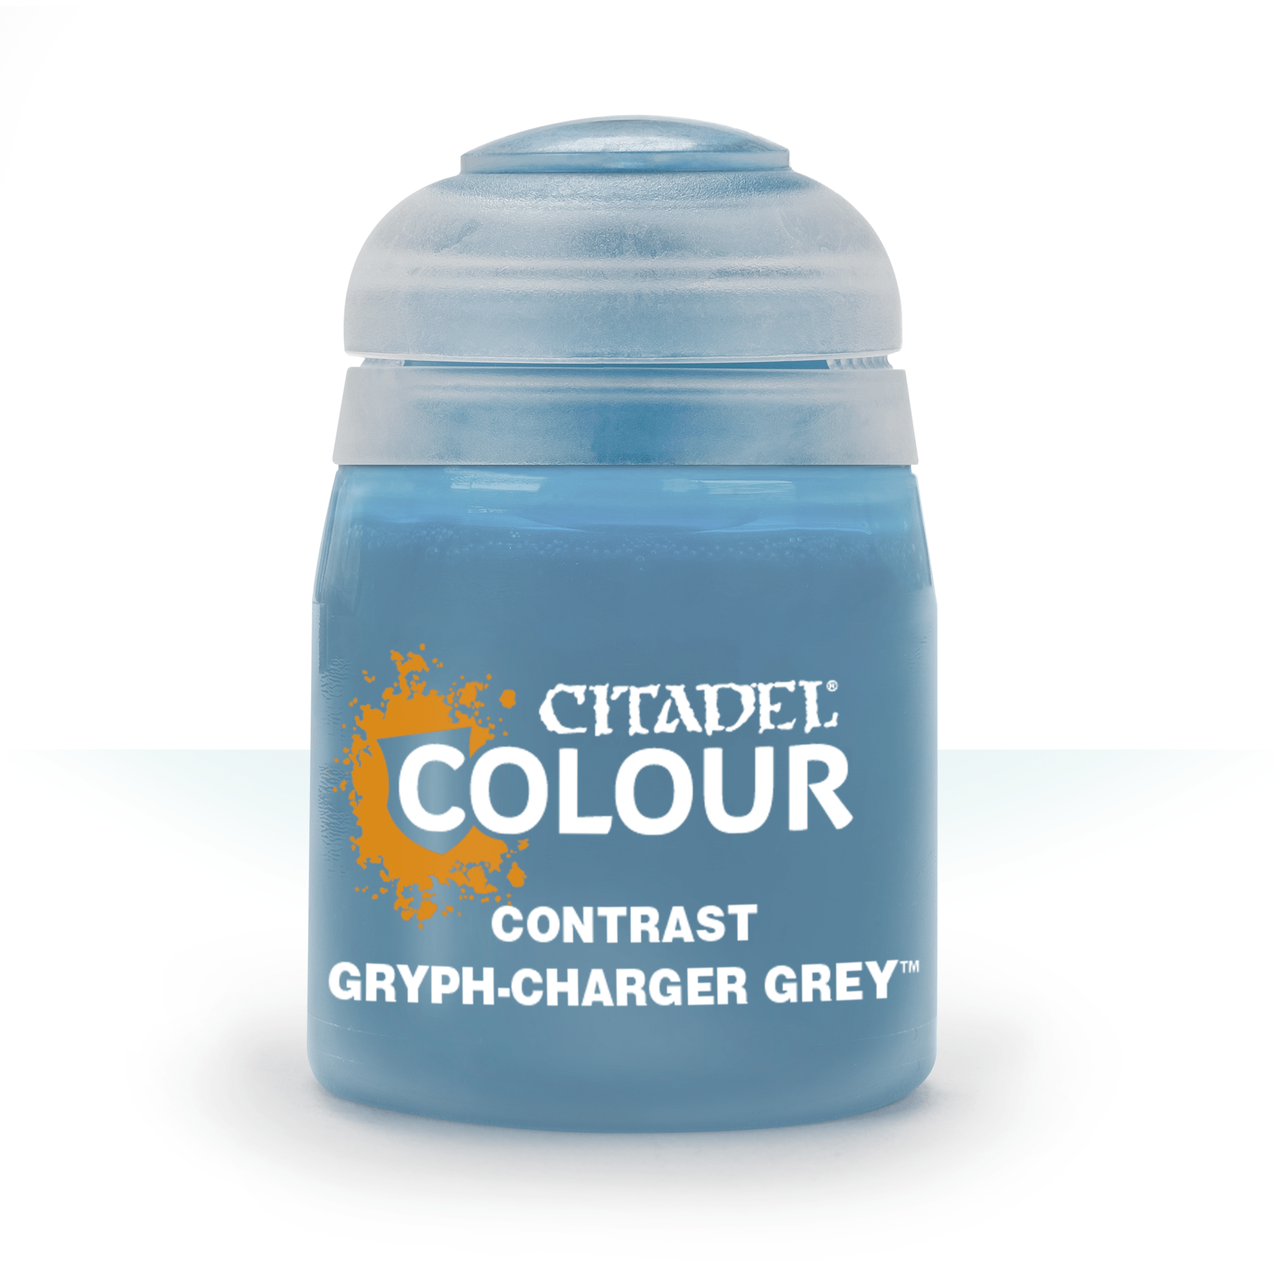 ВАРХАММЕР АКСЕССУАРЫ: CONTRAST: GRYPH-CHARGER GREY (18ML) - фото 1